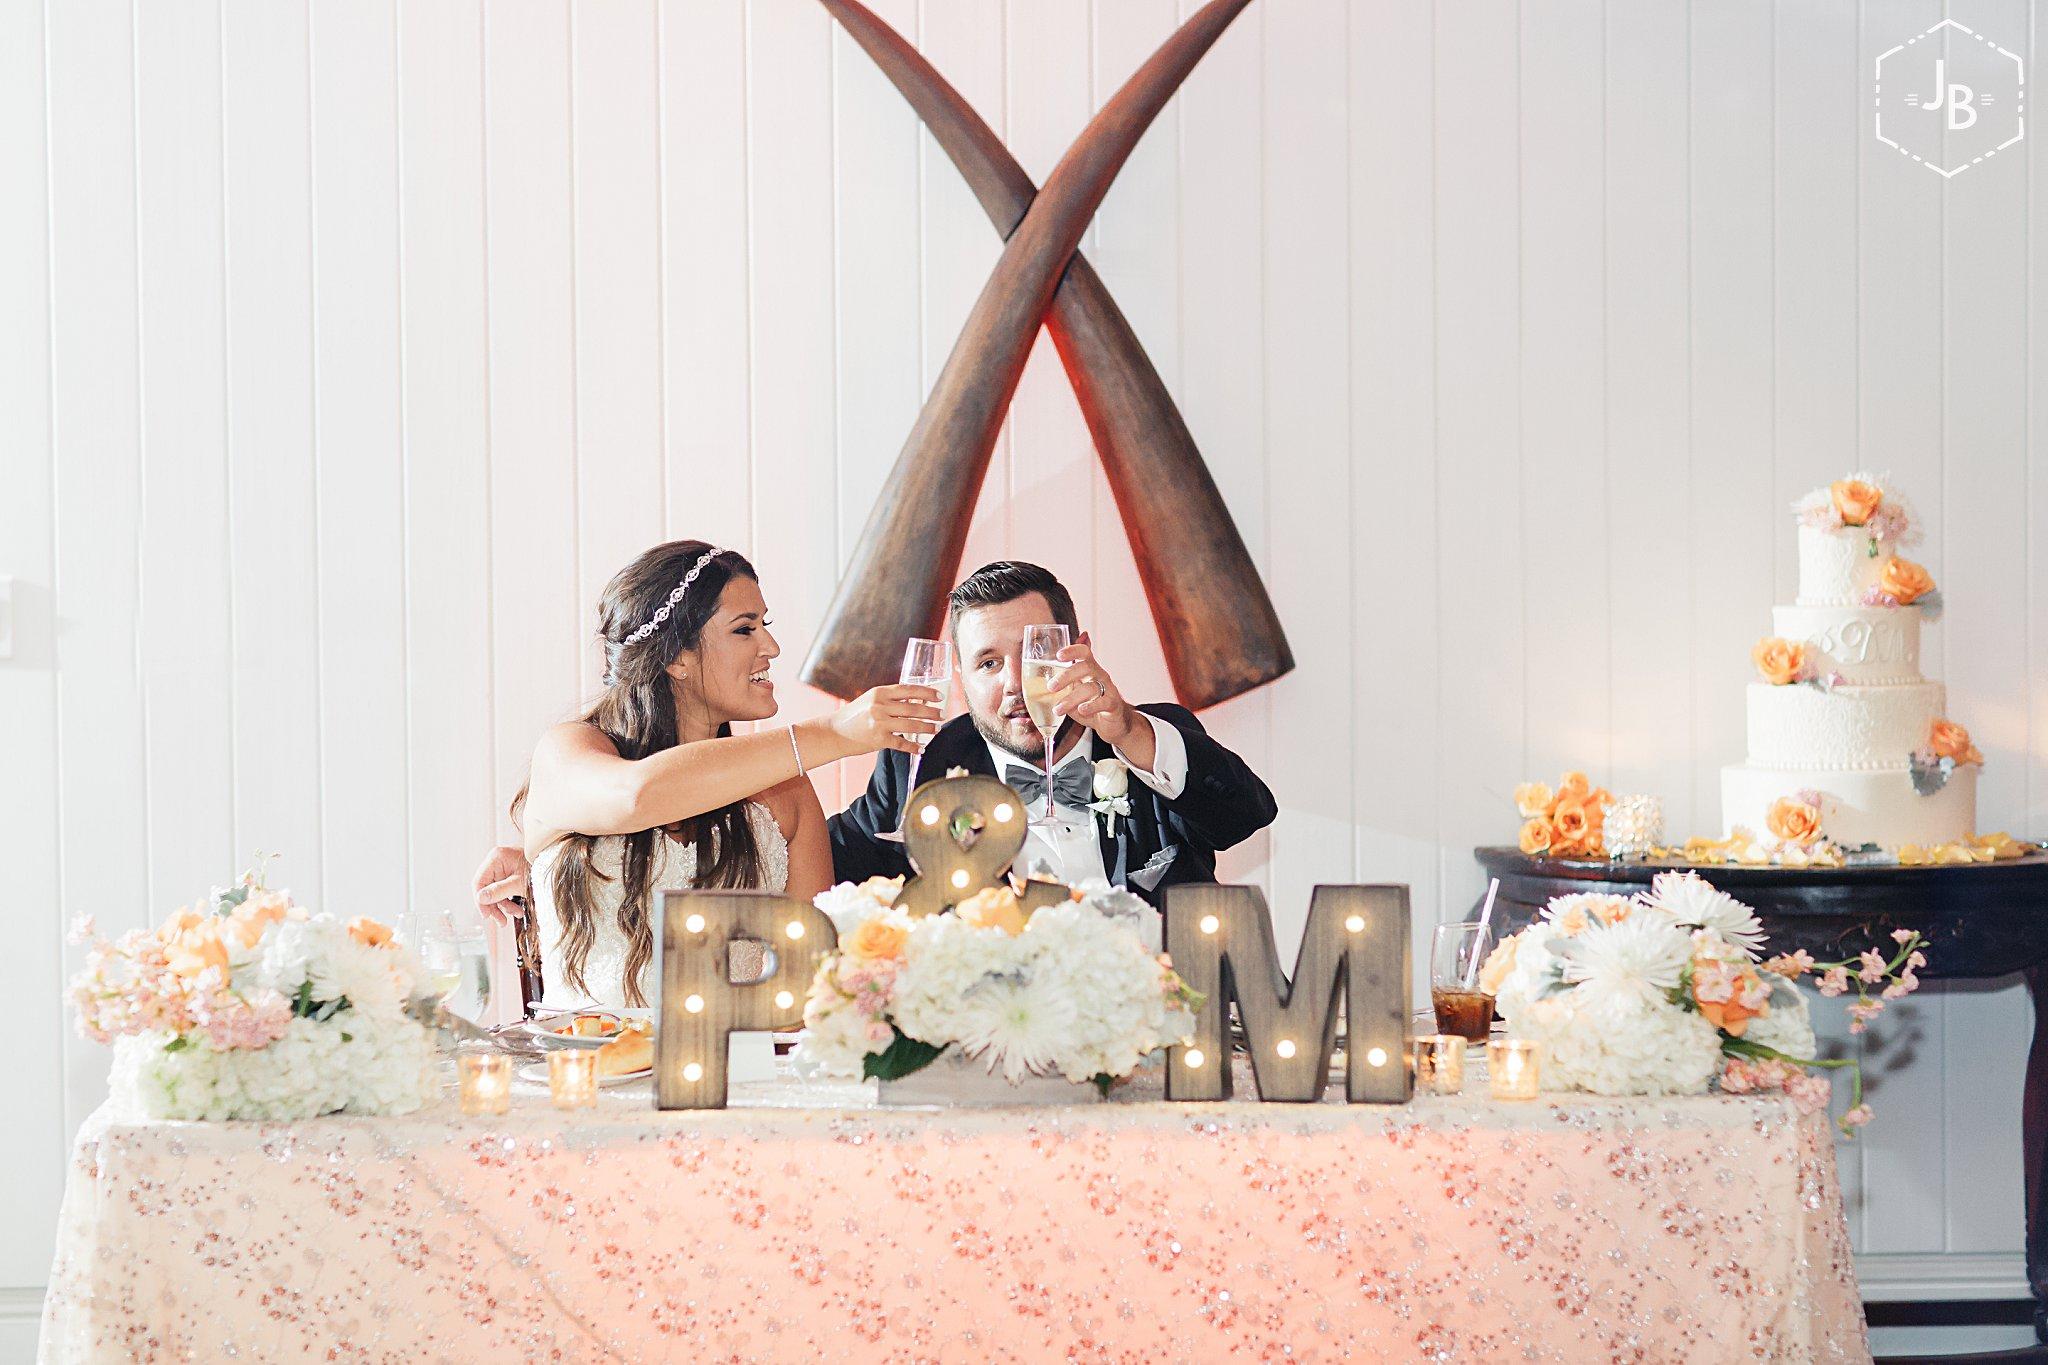 WeddingandEngagementFloridaPhotographer_2825.jpg